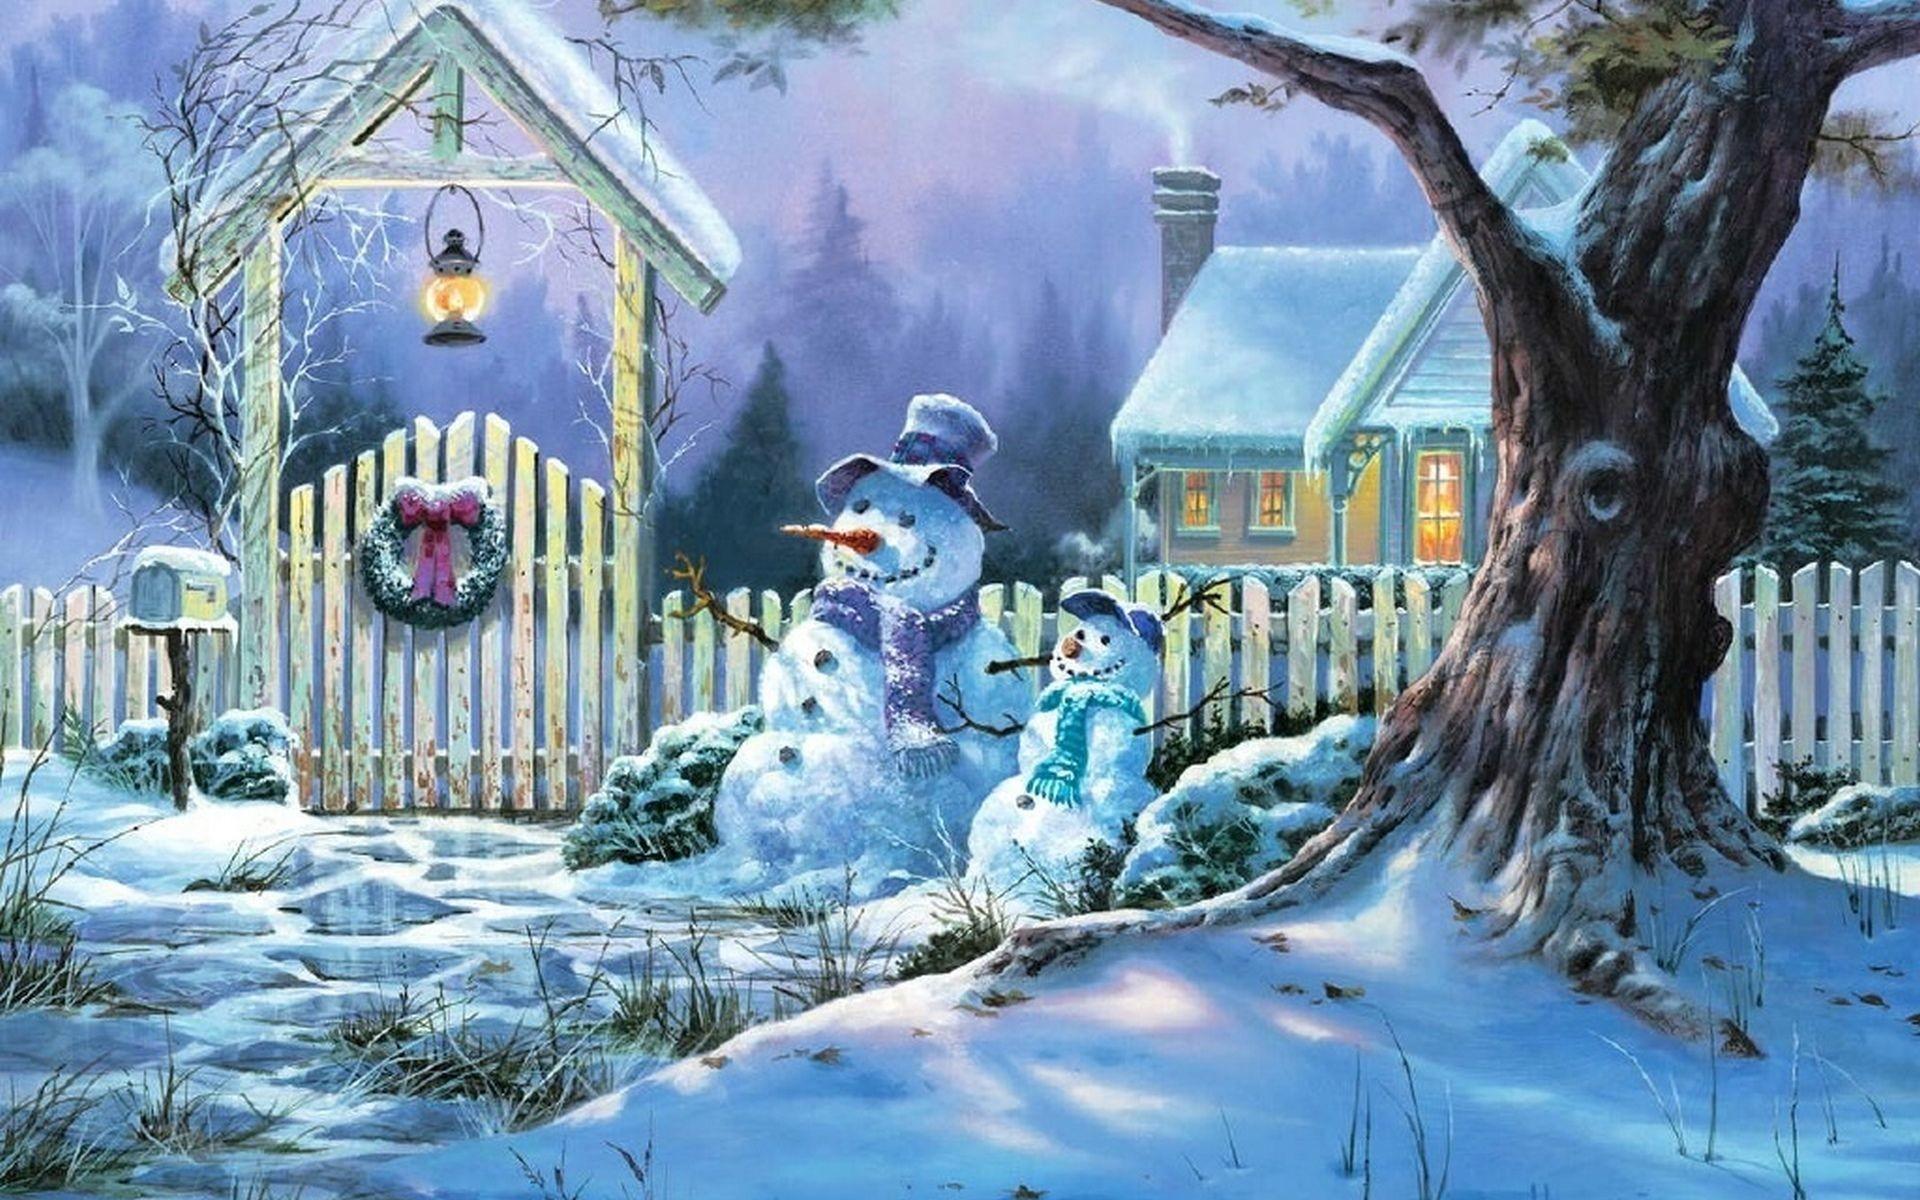 Snowy Christmas Wallpaper